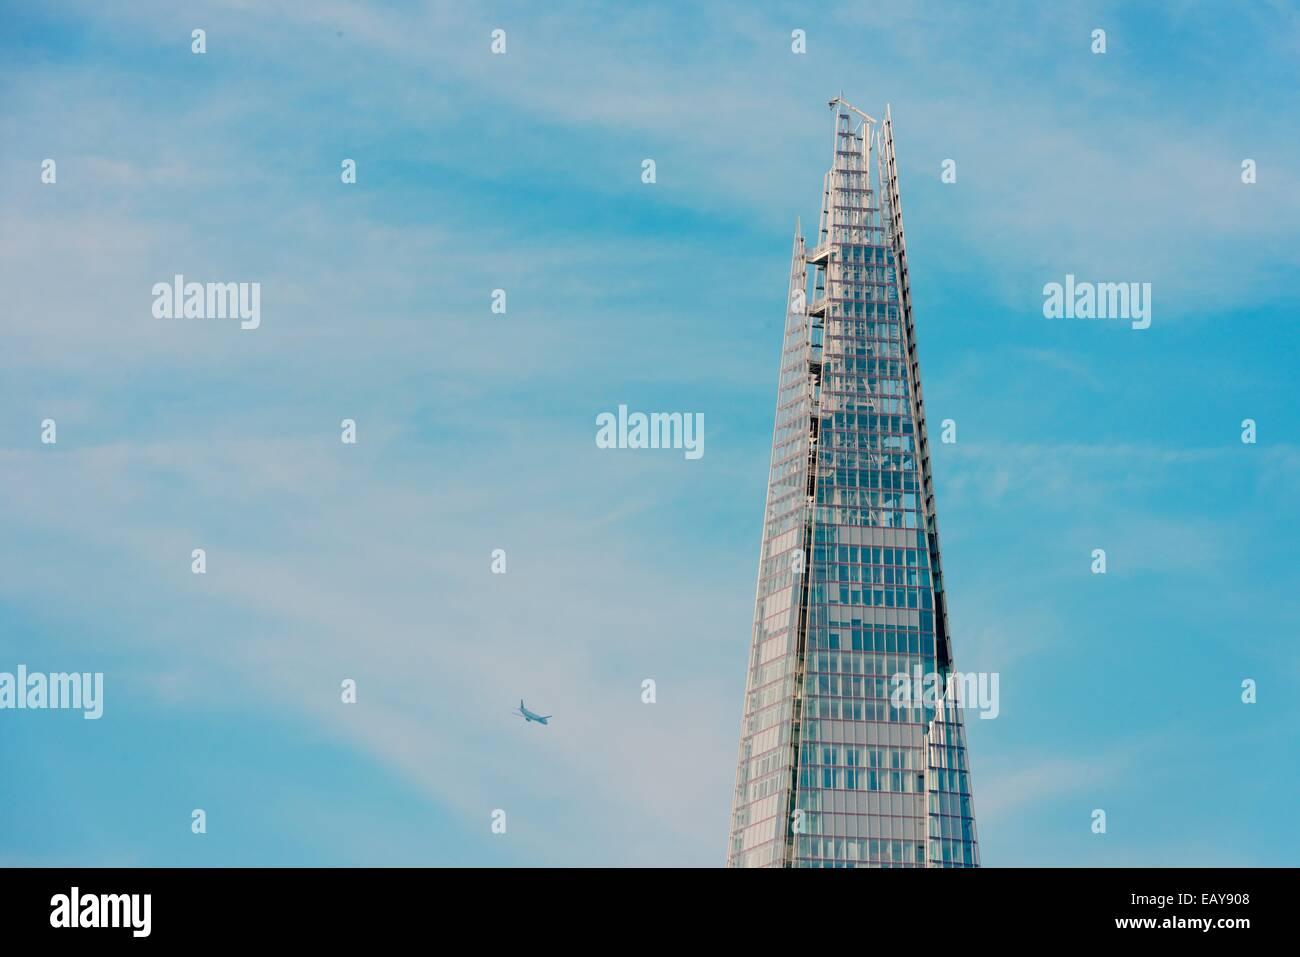 The Shard, London tall building, blue sky, aircraft - Stock Image